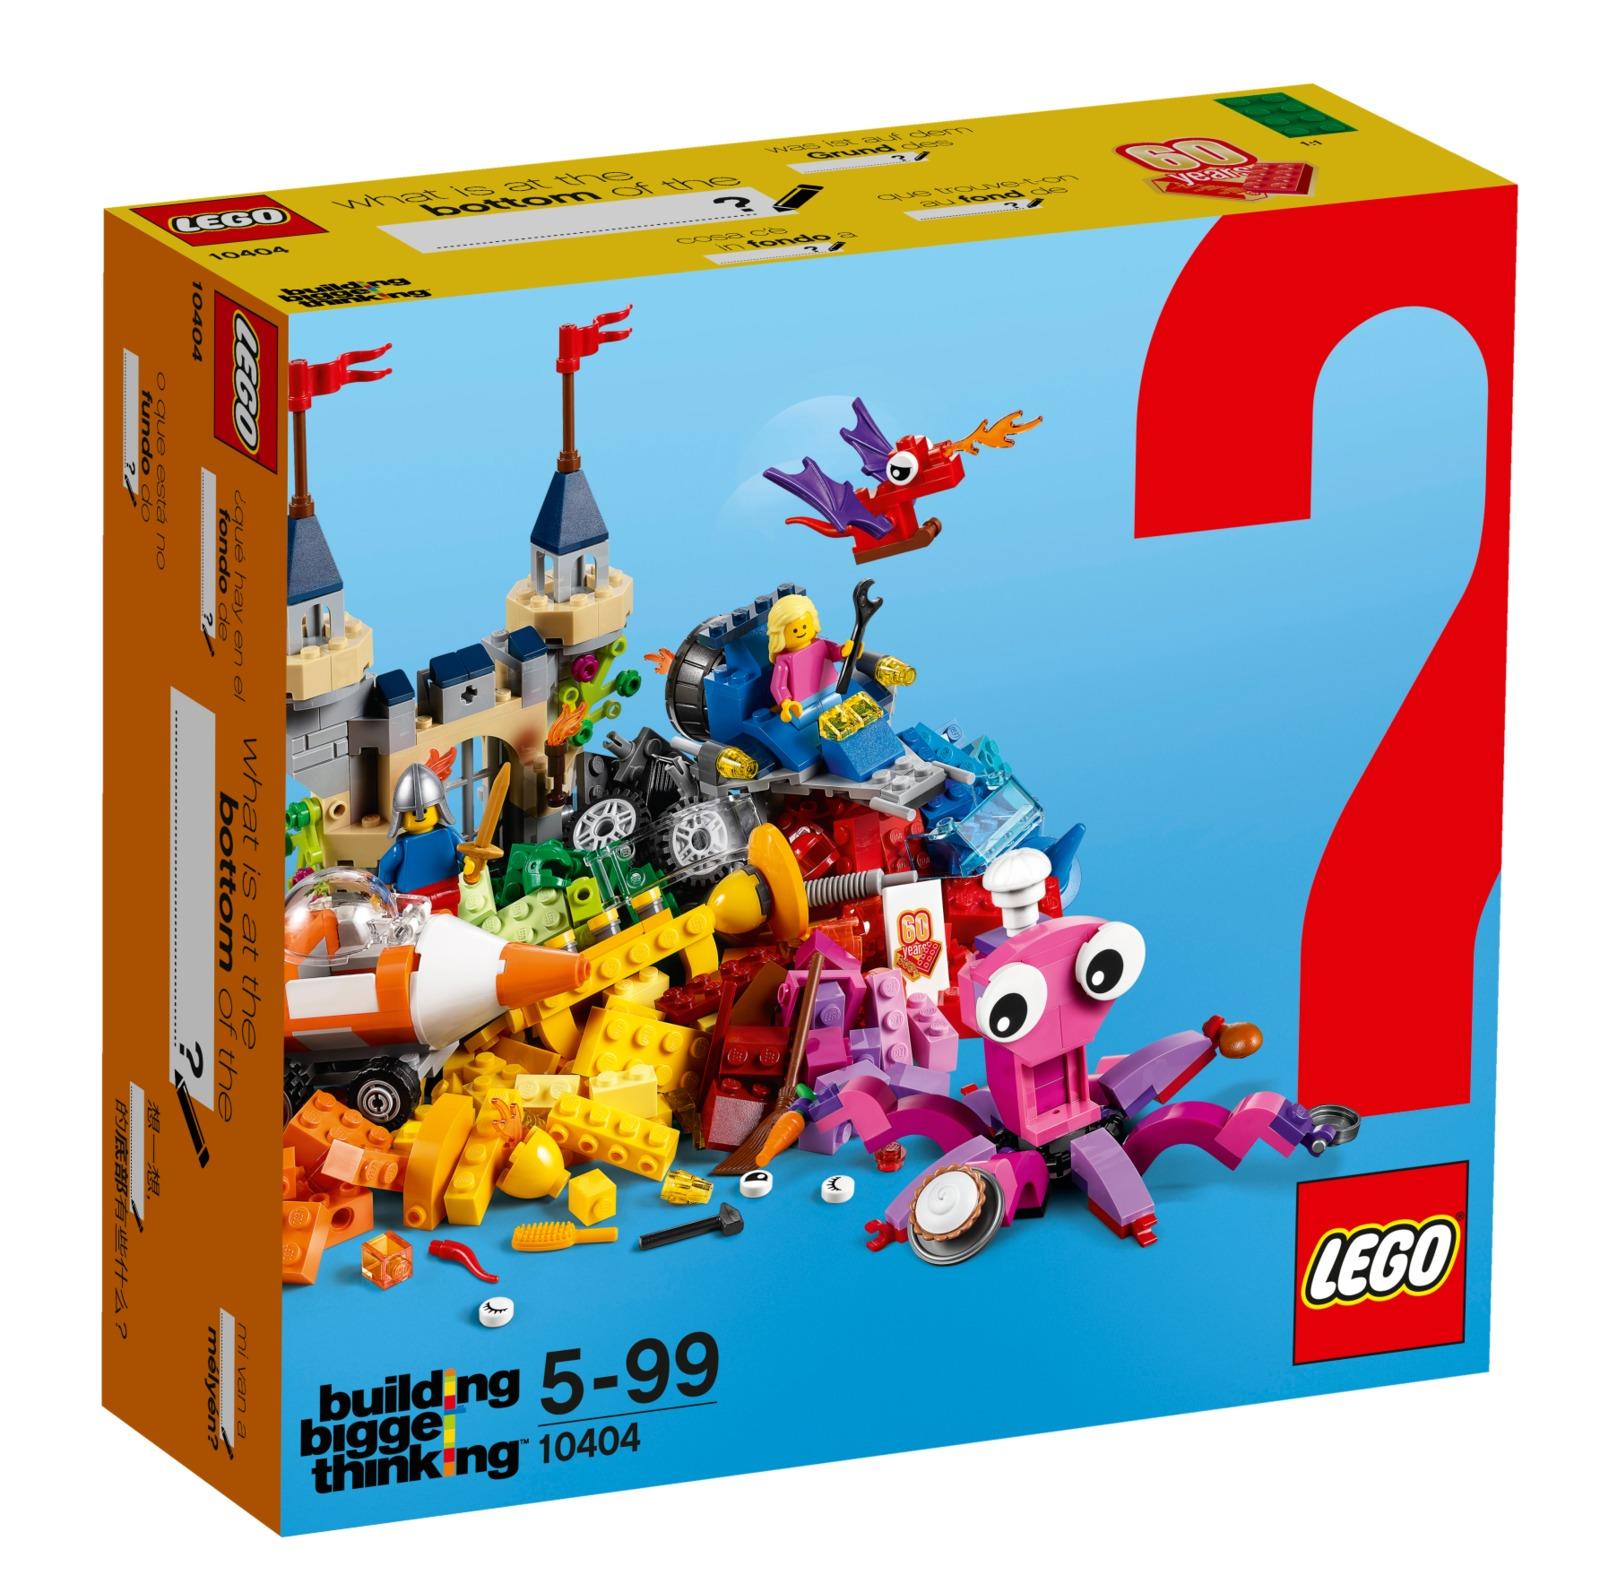 Lego Classic Oceans Bottom 10404 Toy At Mighty Ape Nz 10709 Orange Creativity Box